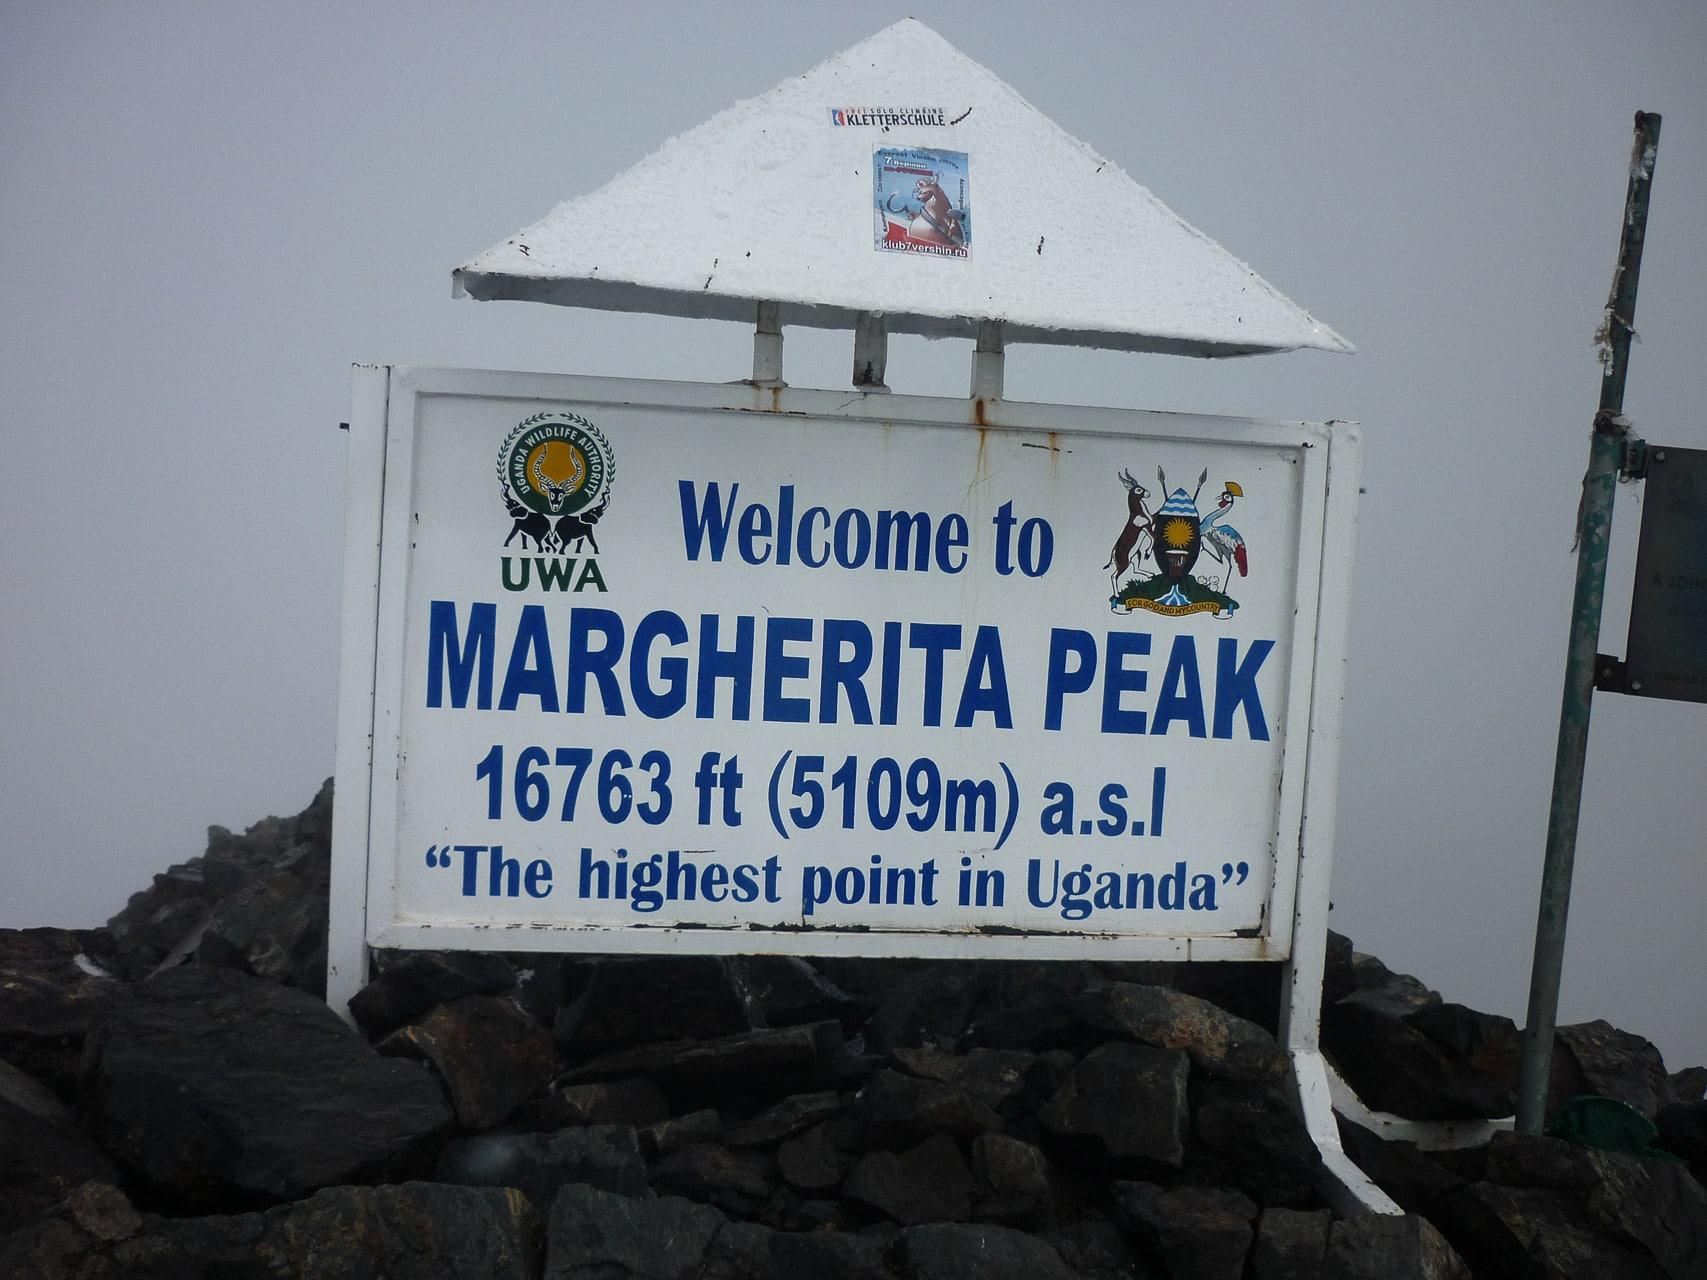 Margherita-Peak-Ruwenzori-Uganda-Globetrotter-Select-1